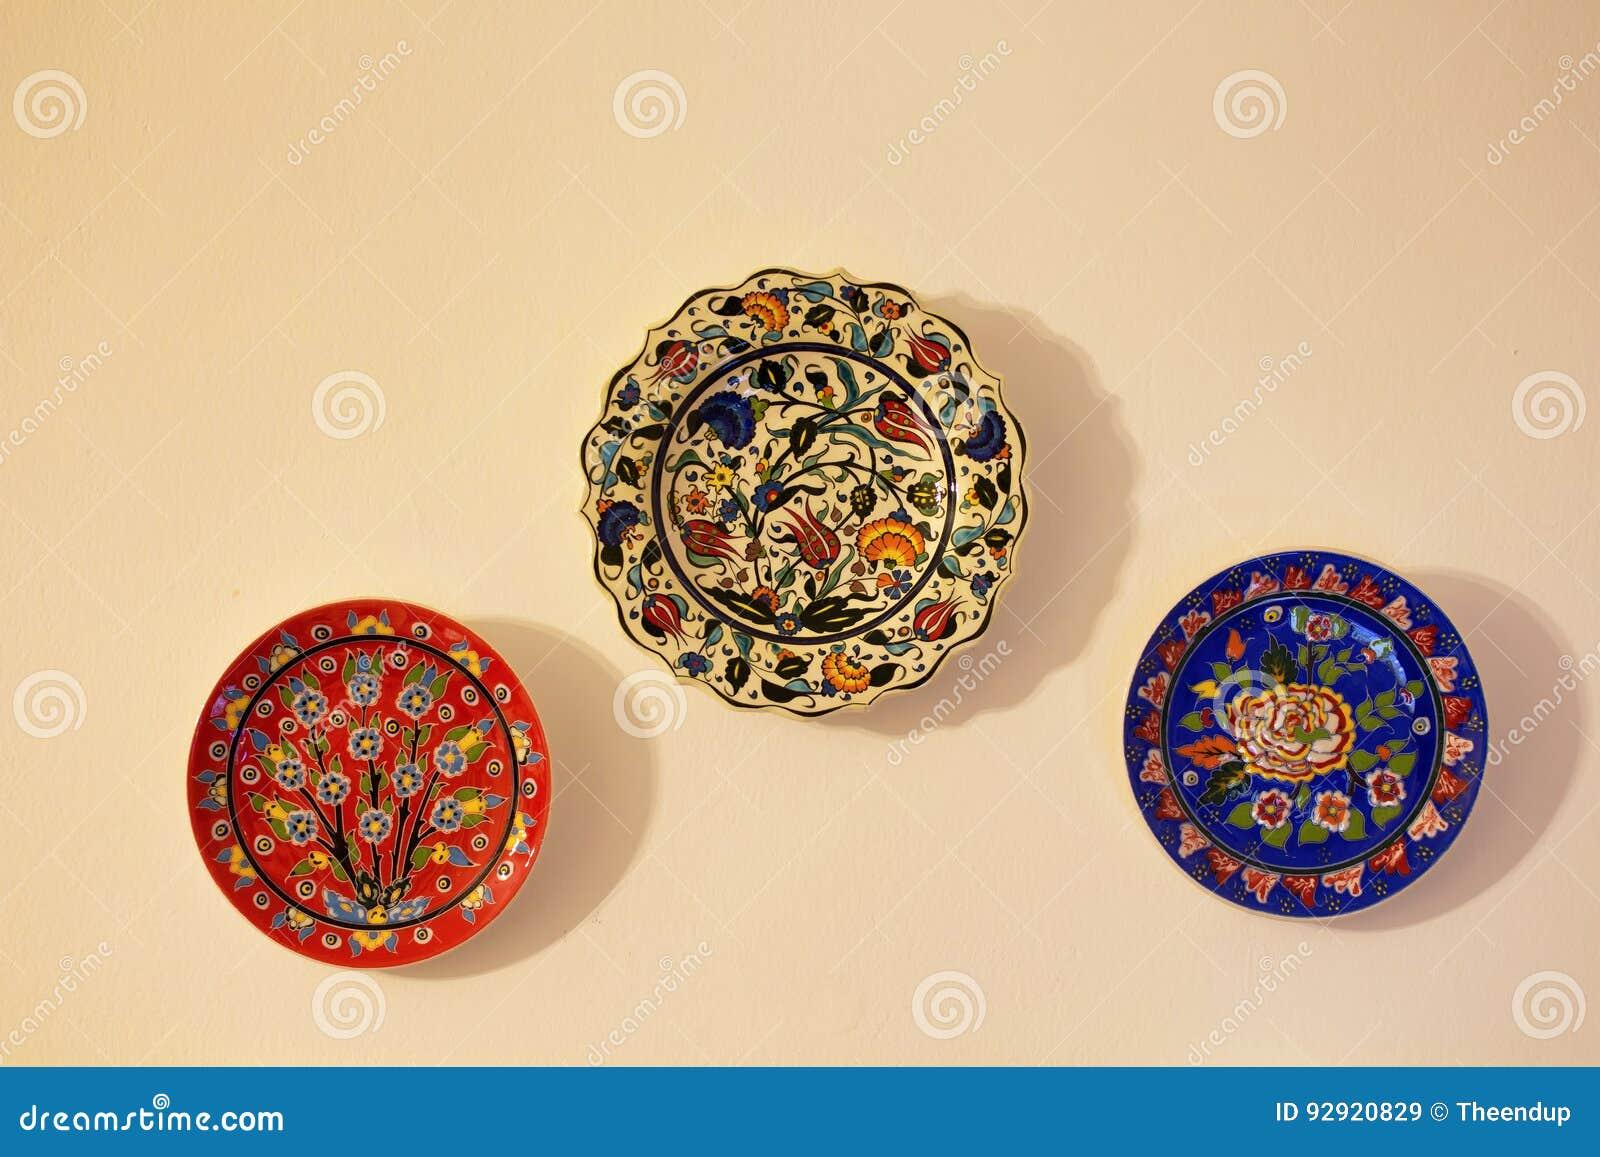 Decorative Ceramic Plates On Beige Wall. Stock Image - Image of ...